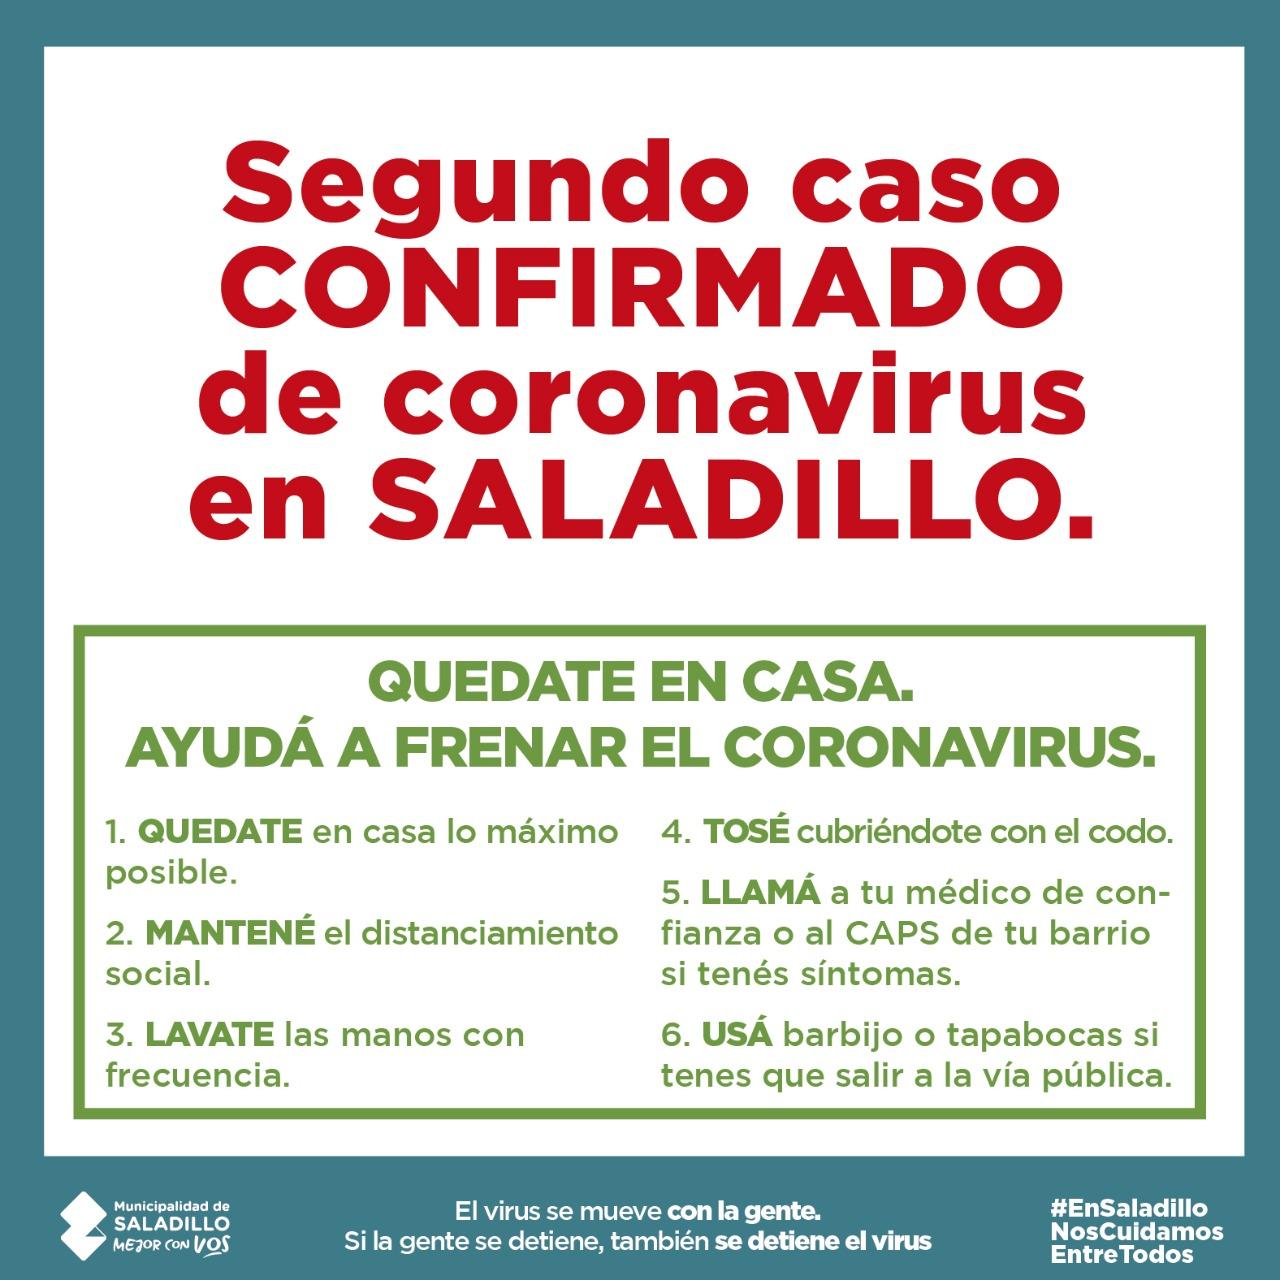 Caso confirmado de coronavirus en Saladillo